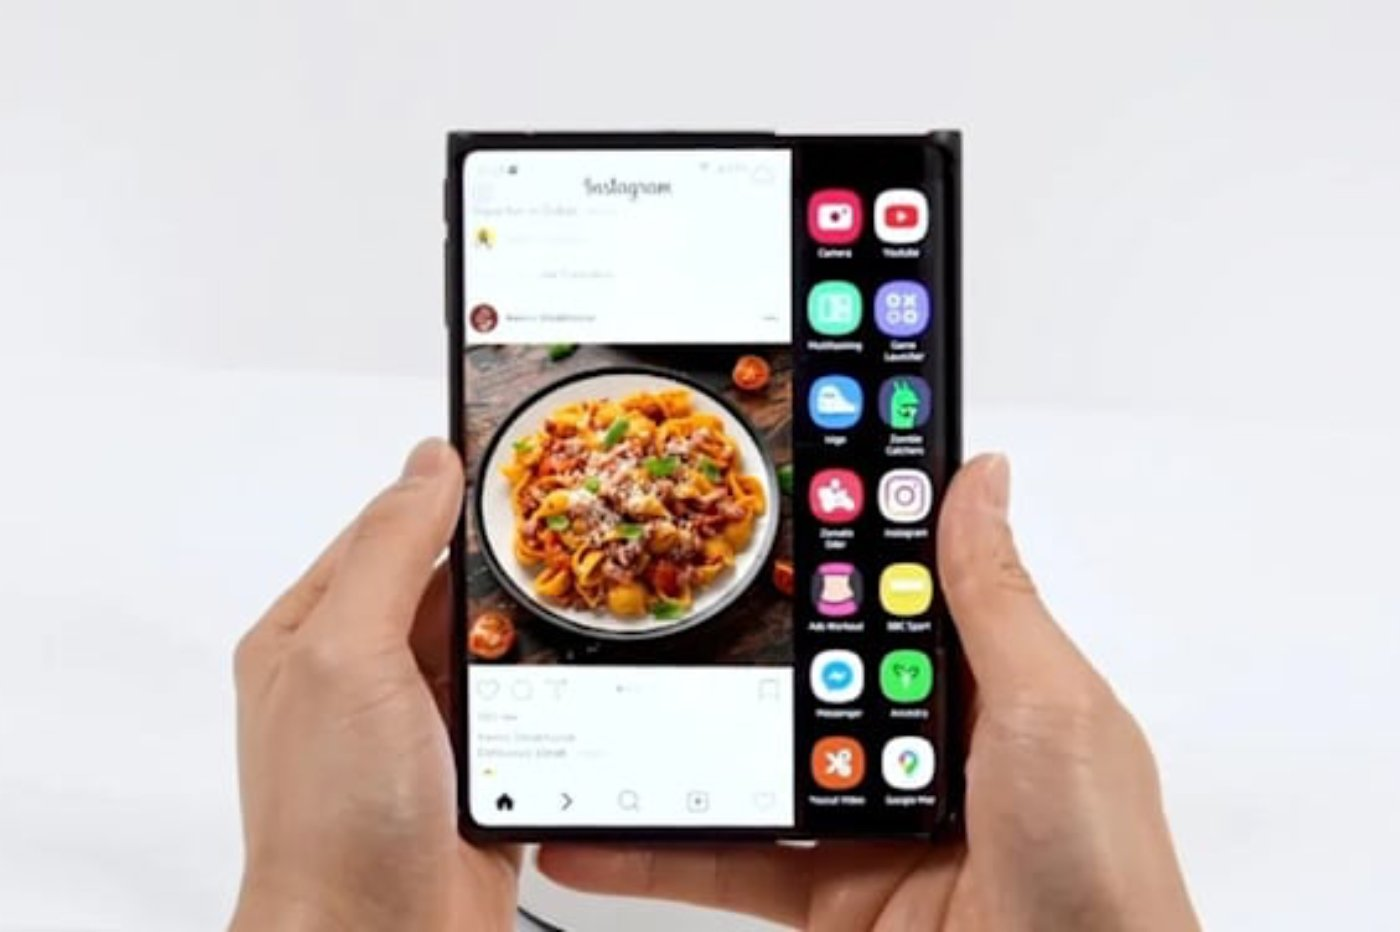 Samsung roll-up screen